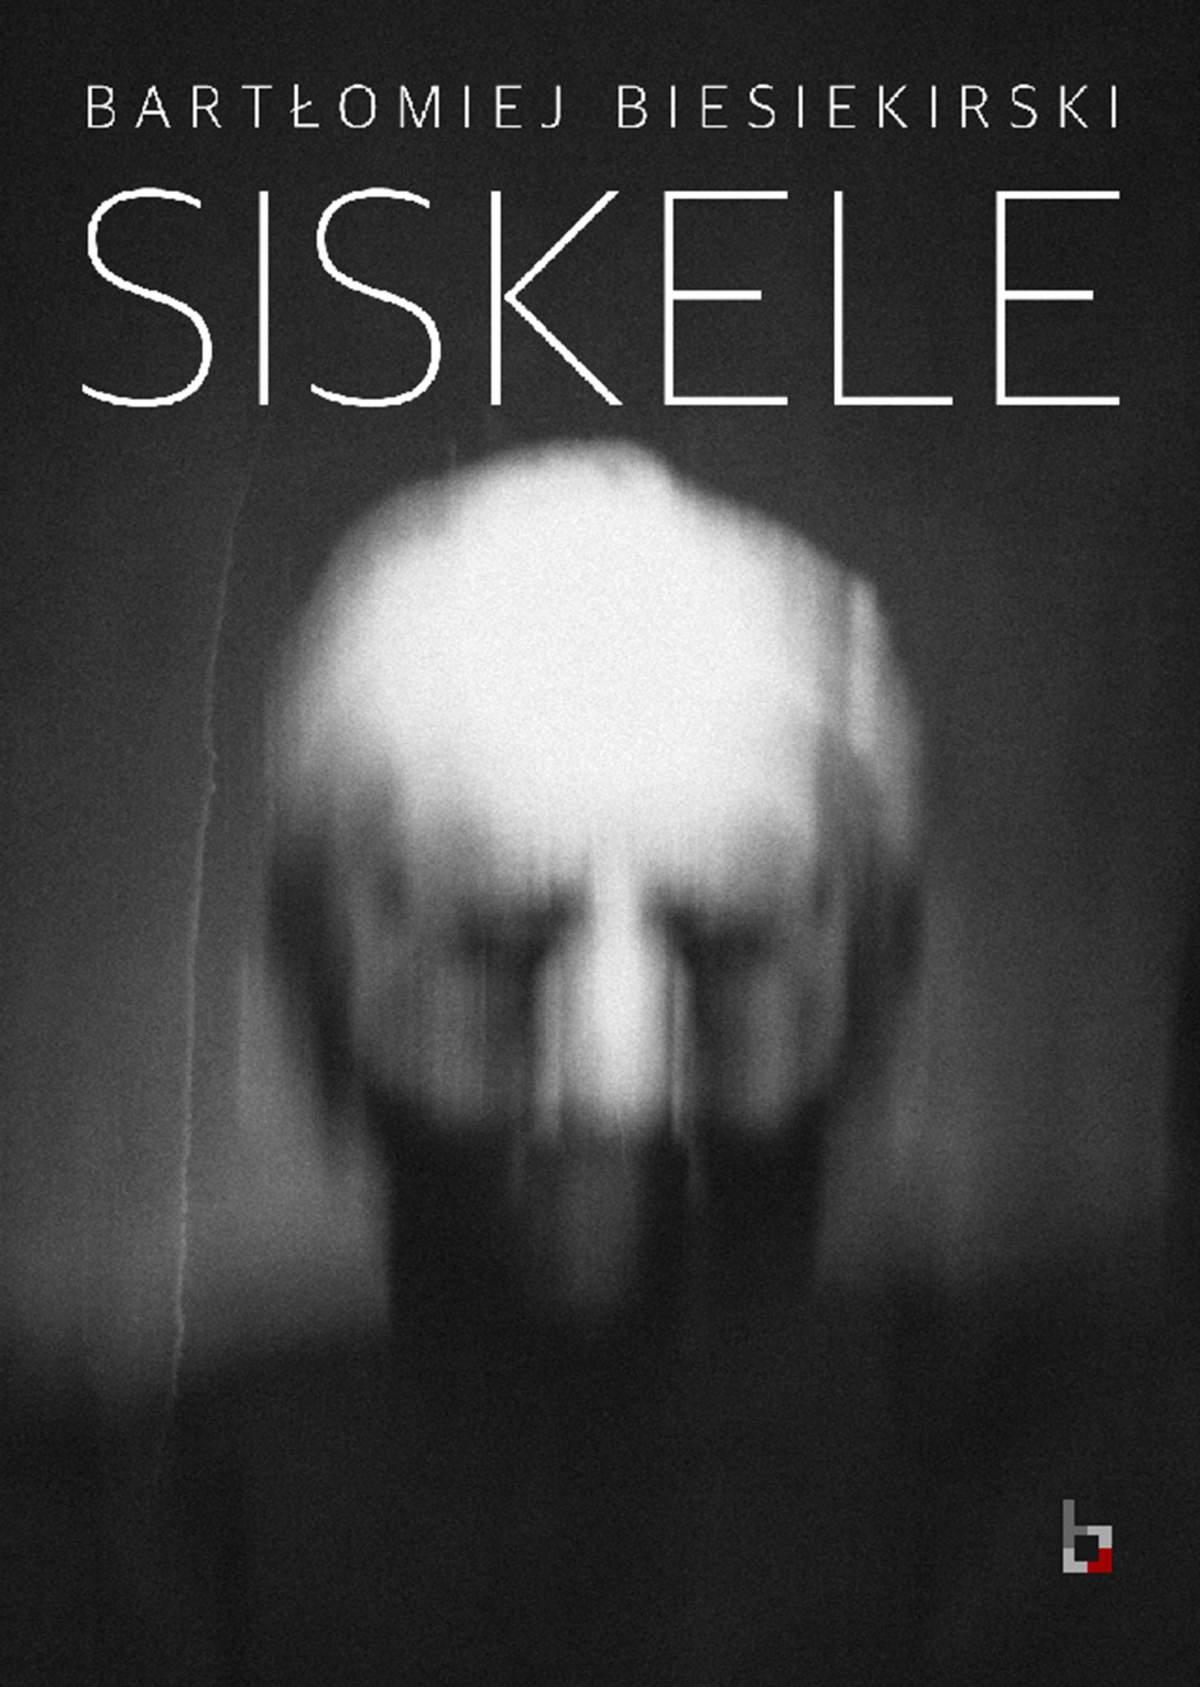 Siskele - Ebook (Książka na Kindle) do pobrania w formacie MOBI